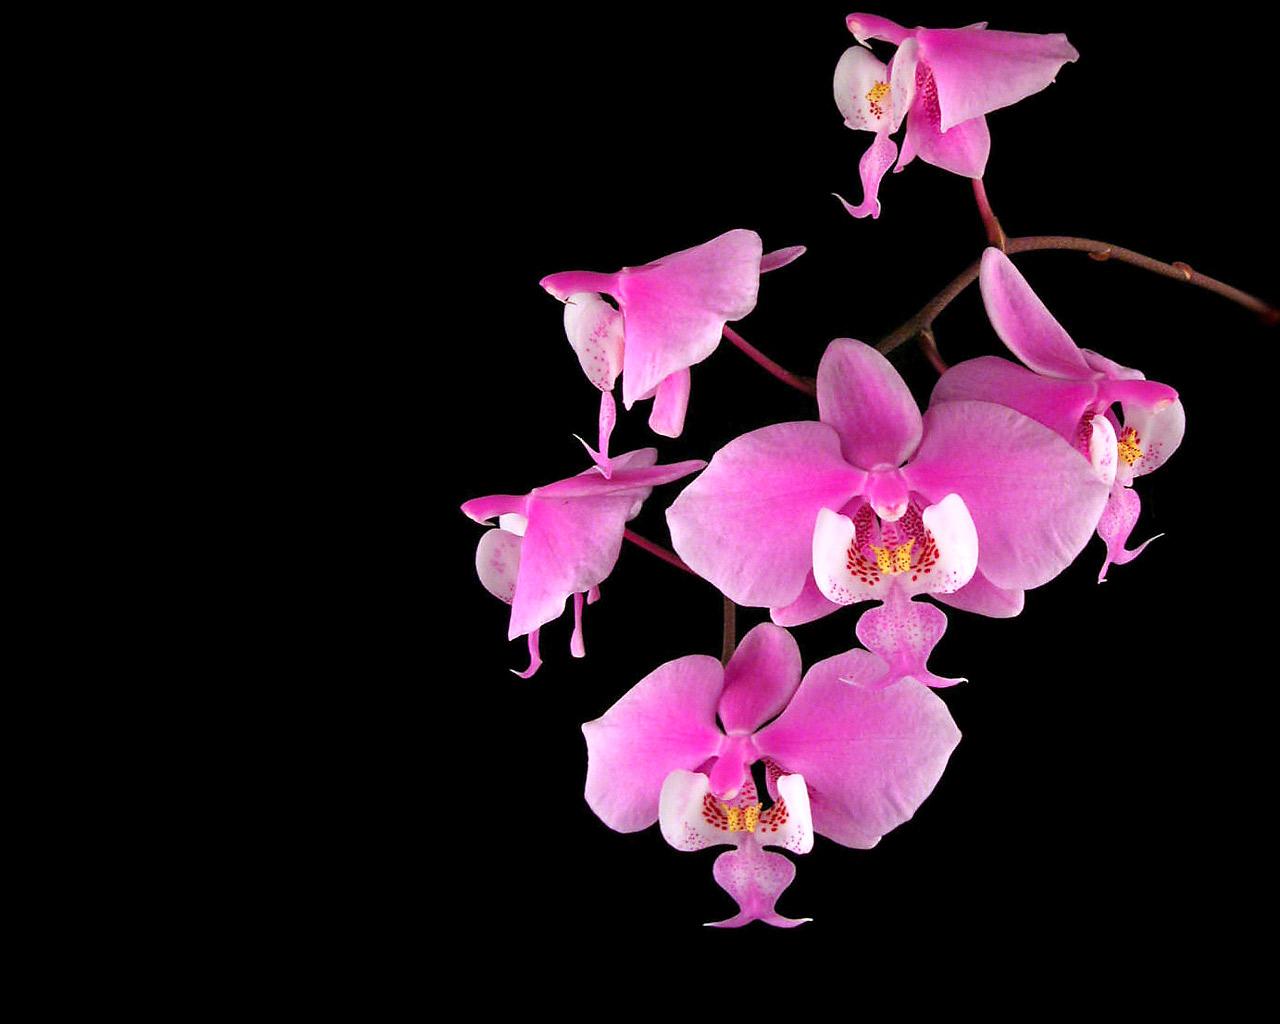 orchids images